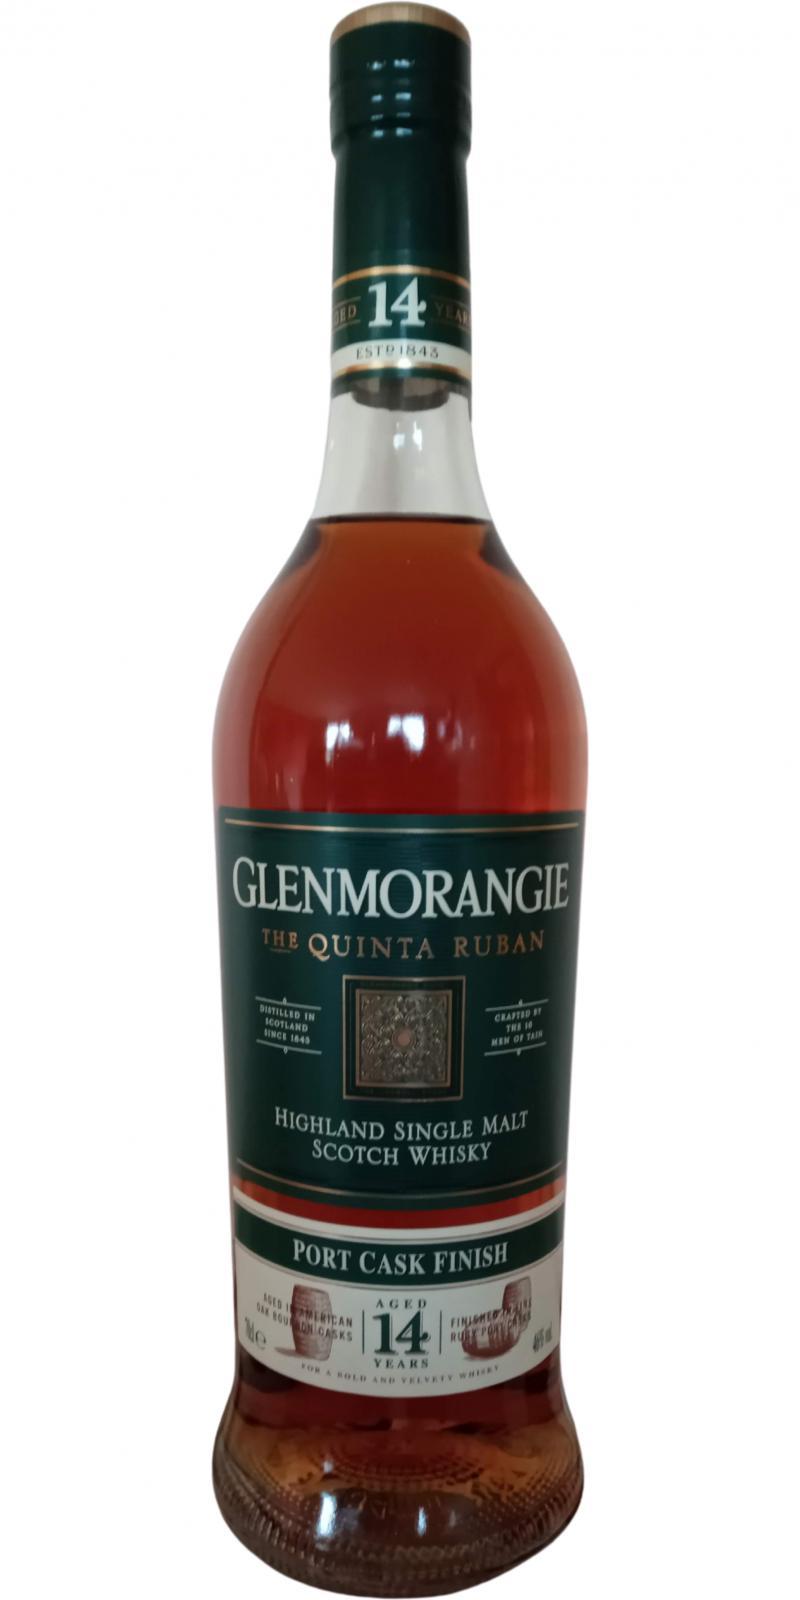 Glenmorangie 14-year-old